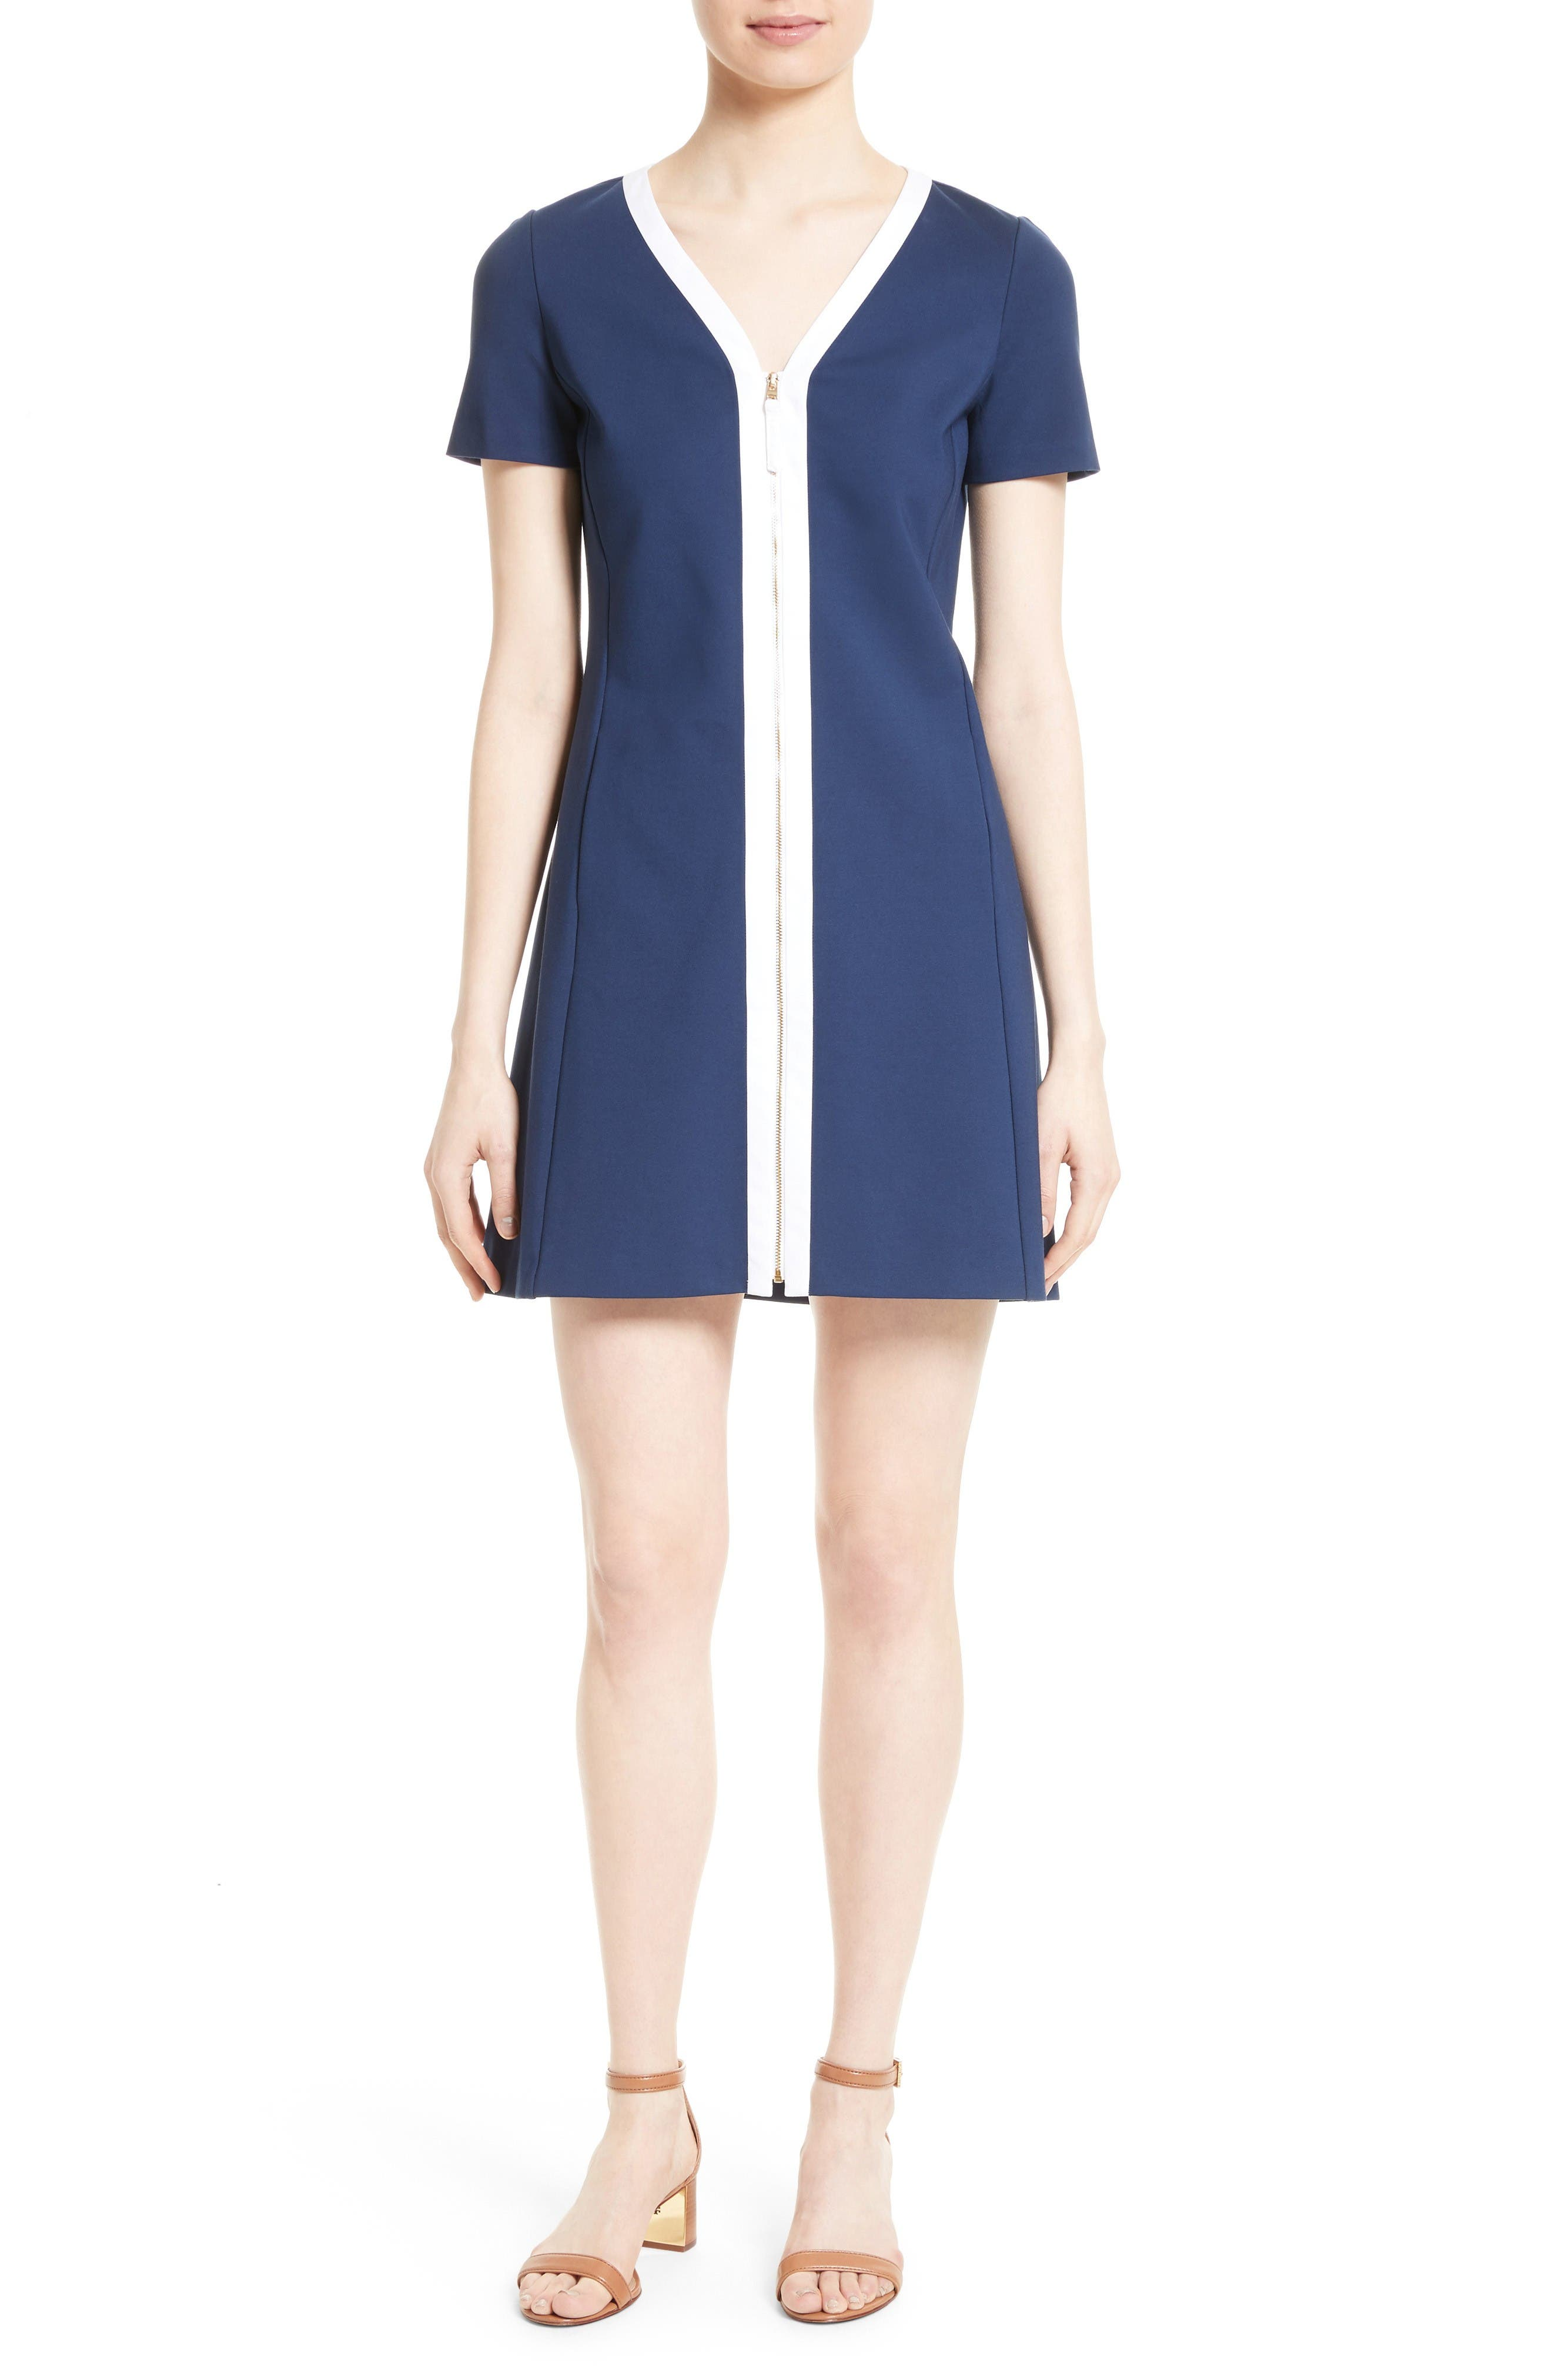 Tory Burch Kimberly Zip Front A-Line Dress